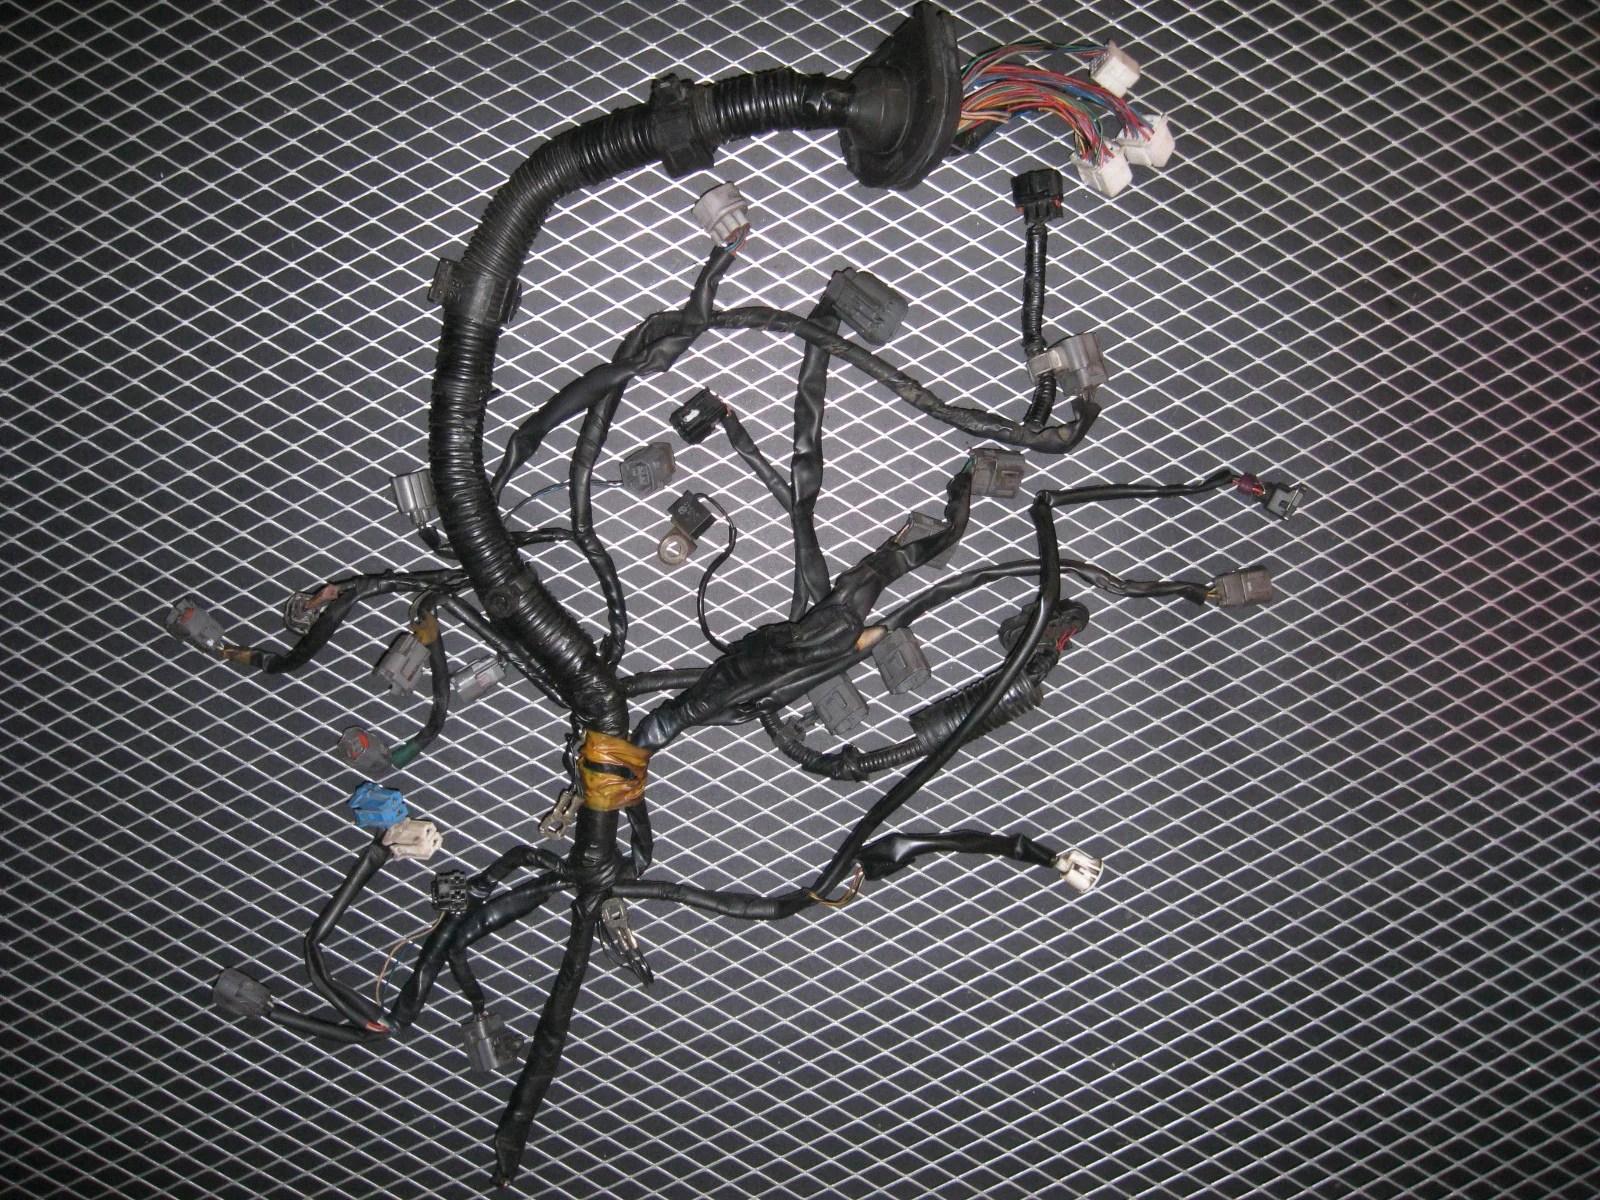 medium resolution of rx8 wiring harness circuits symbols diagrams u2022 1999 gmc yukon denali wiring diagram